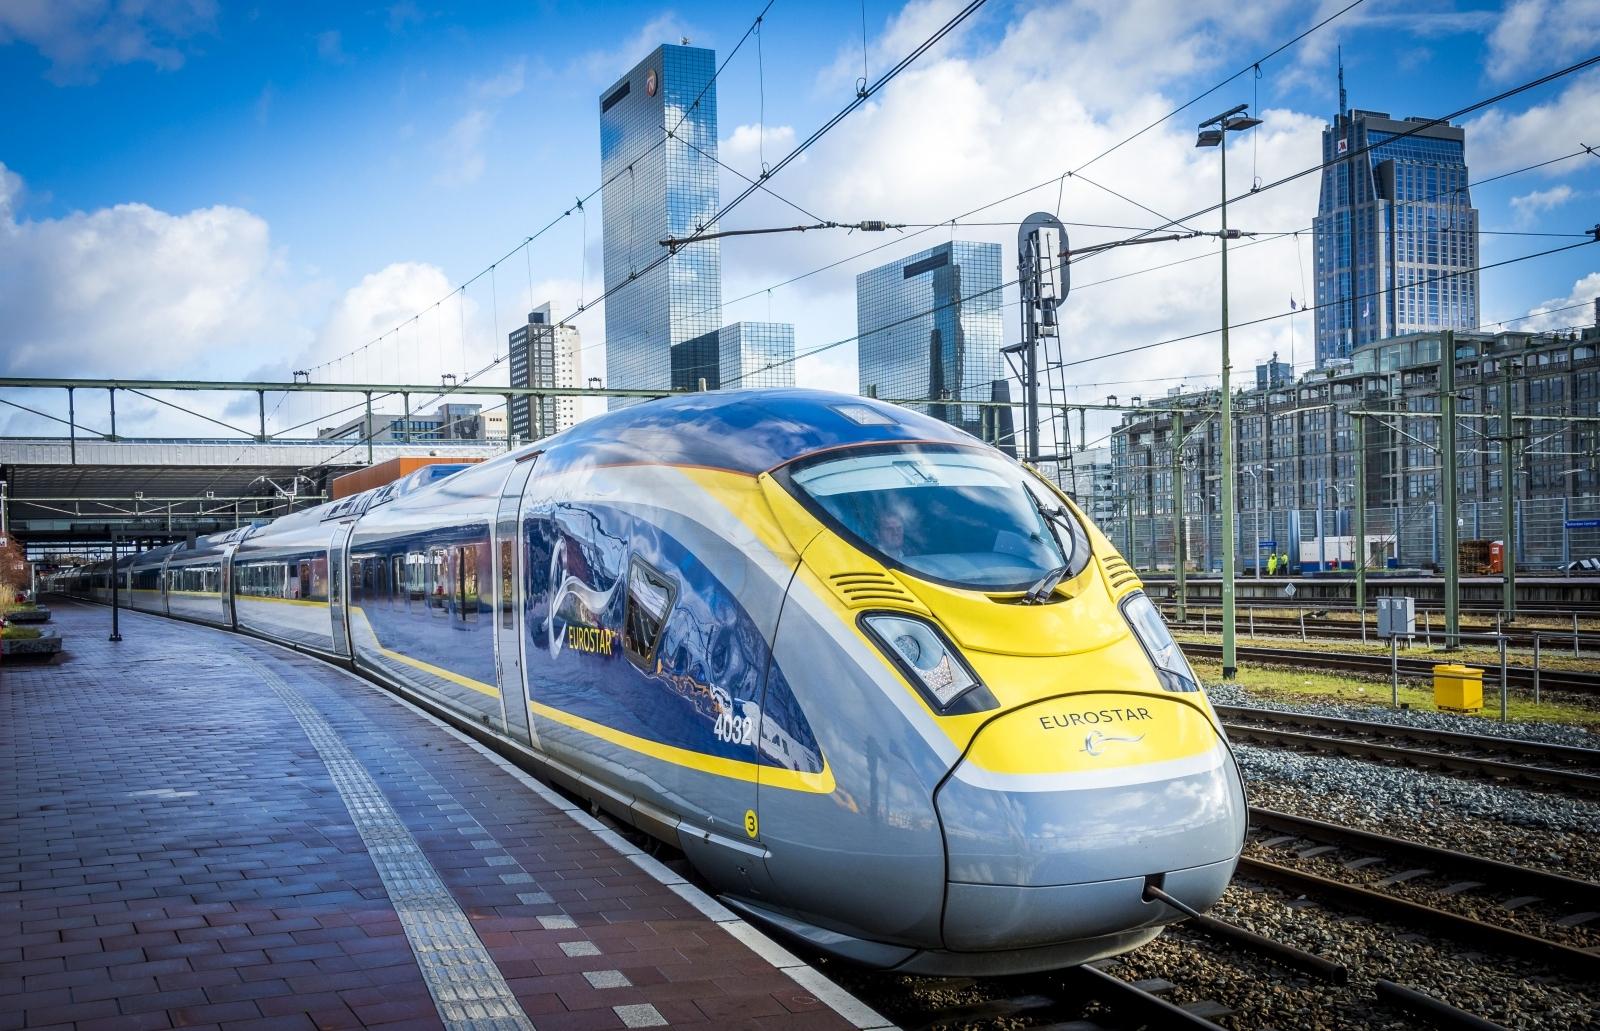 Eurostar in Amsterdam